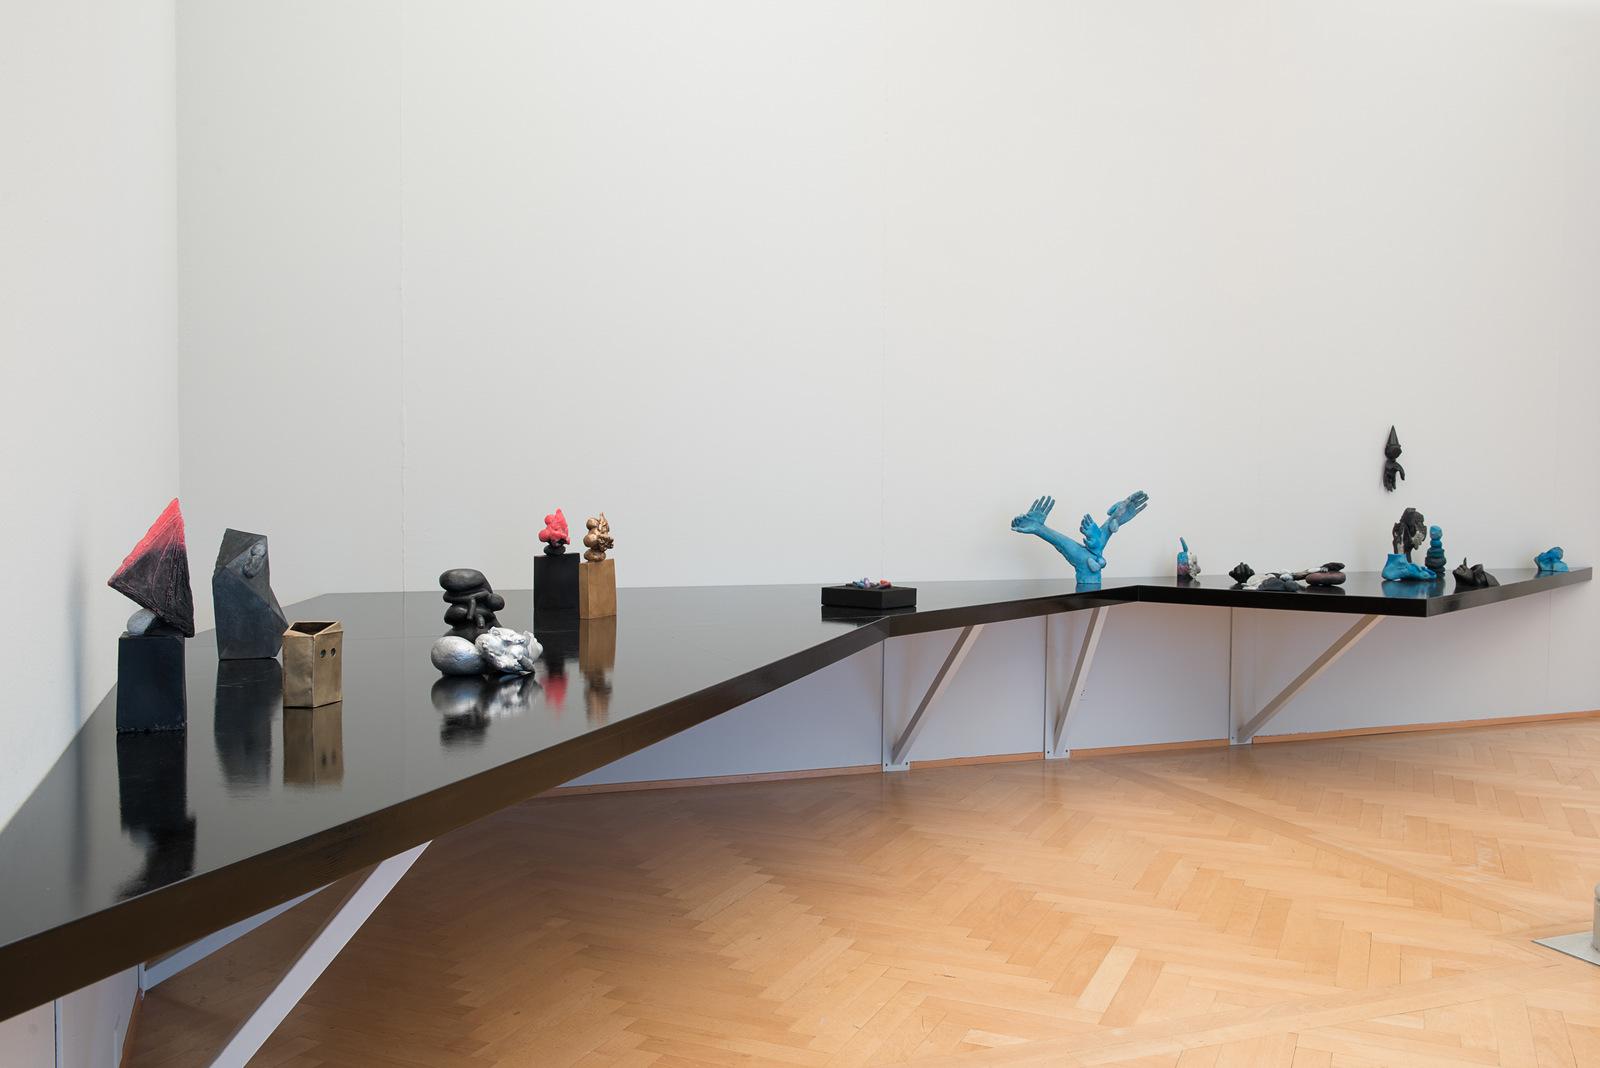 03_Installationsansicht_St.Gallen_Foto_Sebastian_Stadler